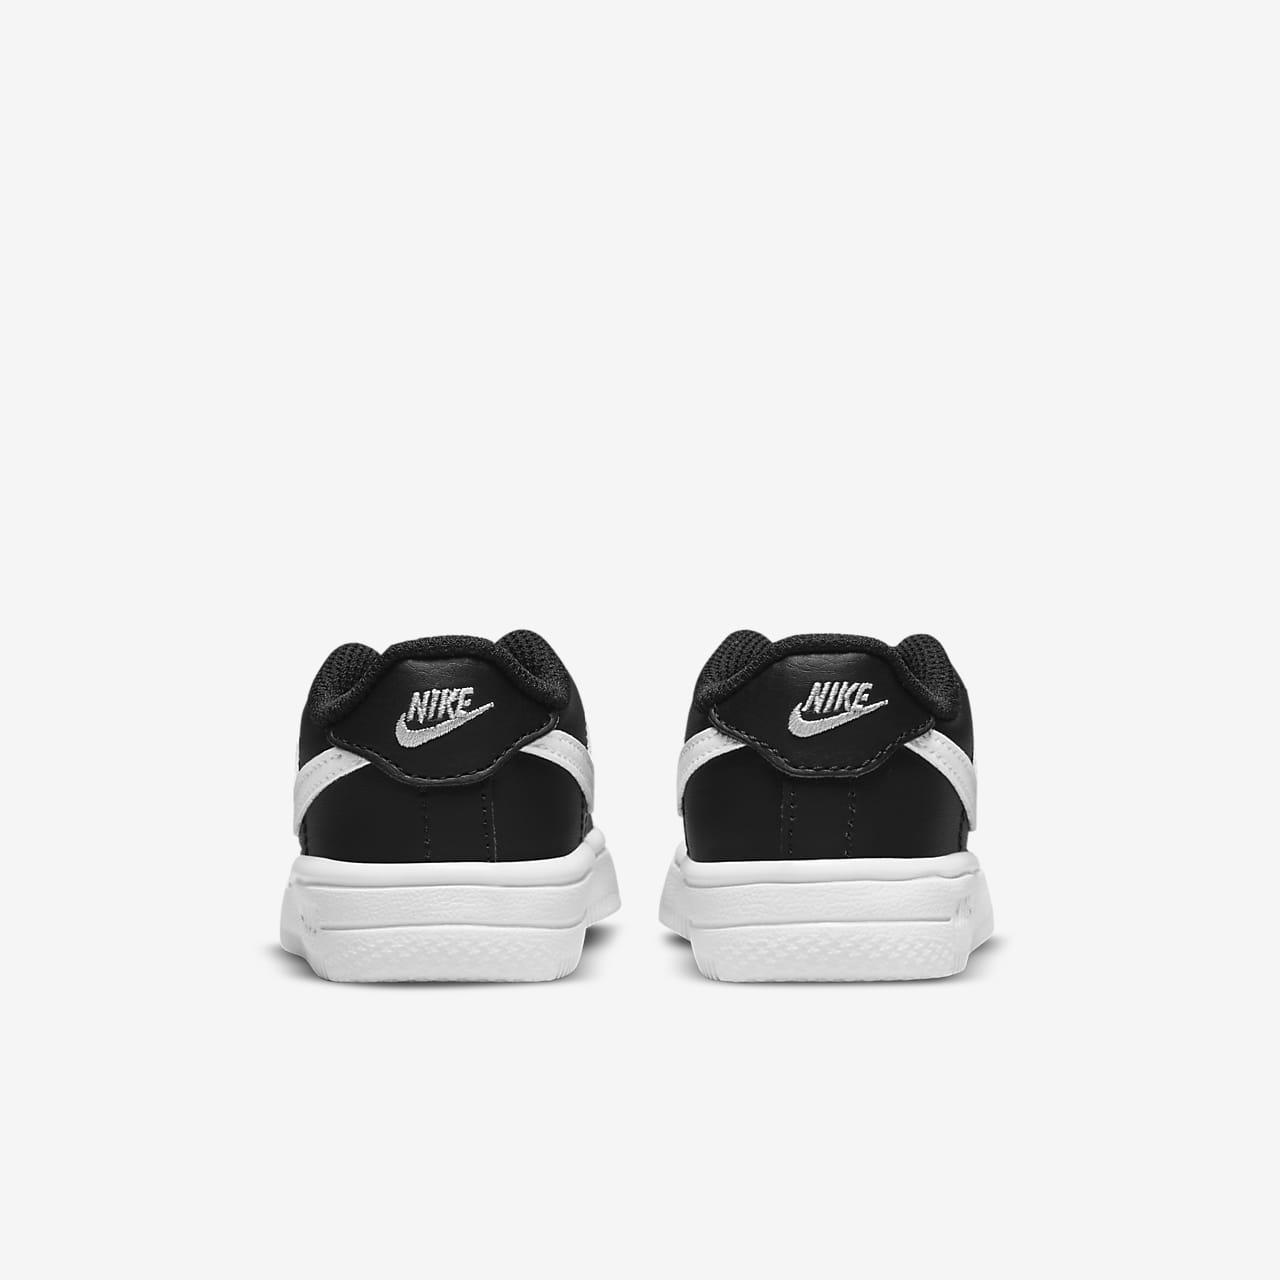 scarpe nike bimbo 1 anno